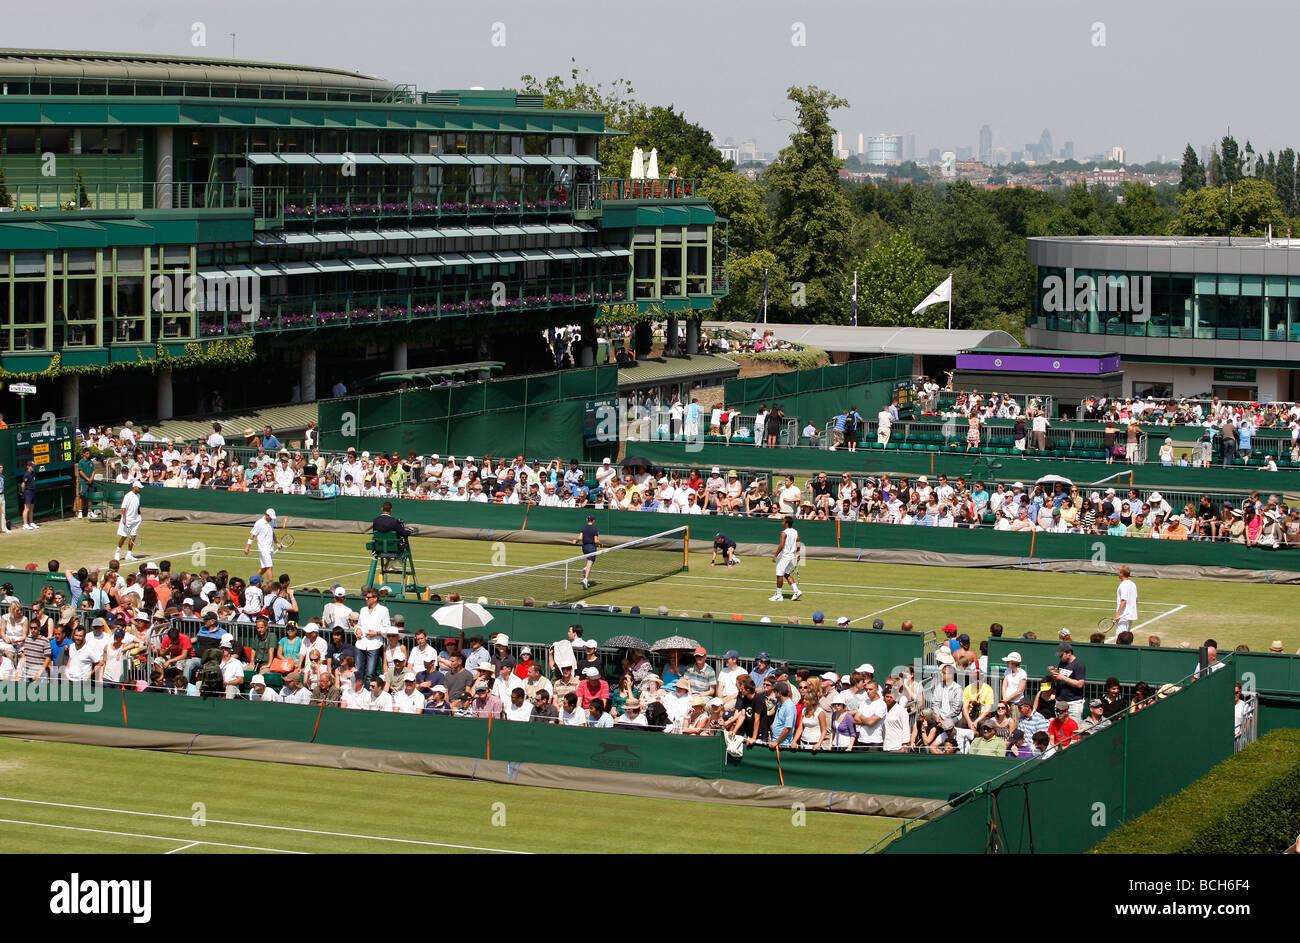 Panorama view of the Wimbledon tennis courts - Stock Image